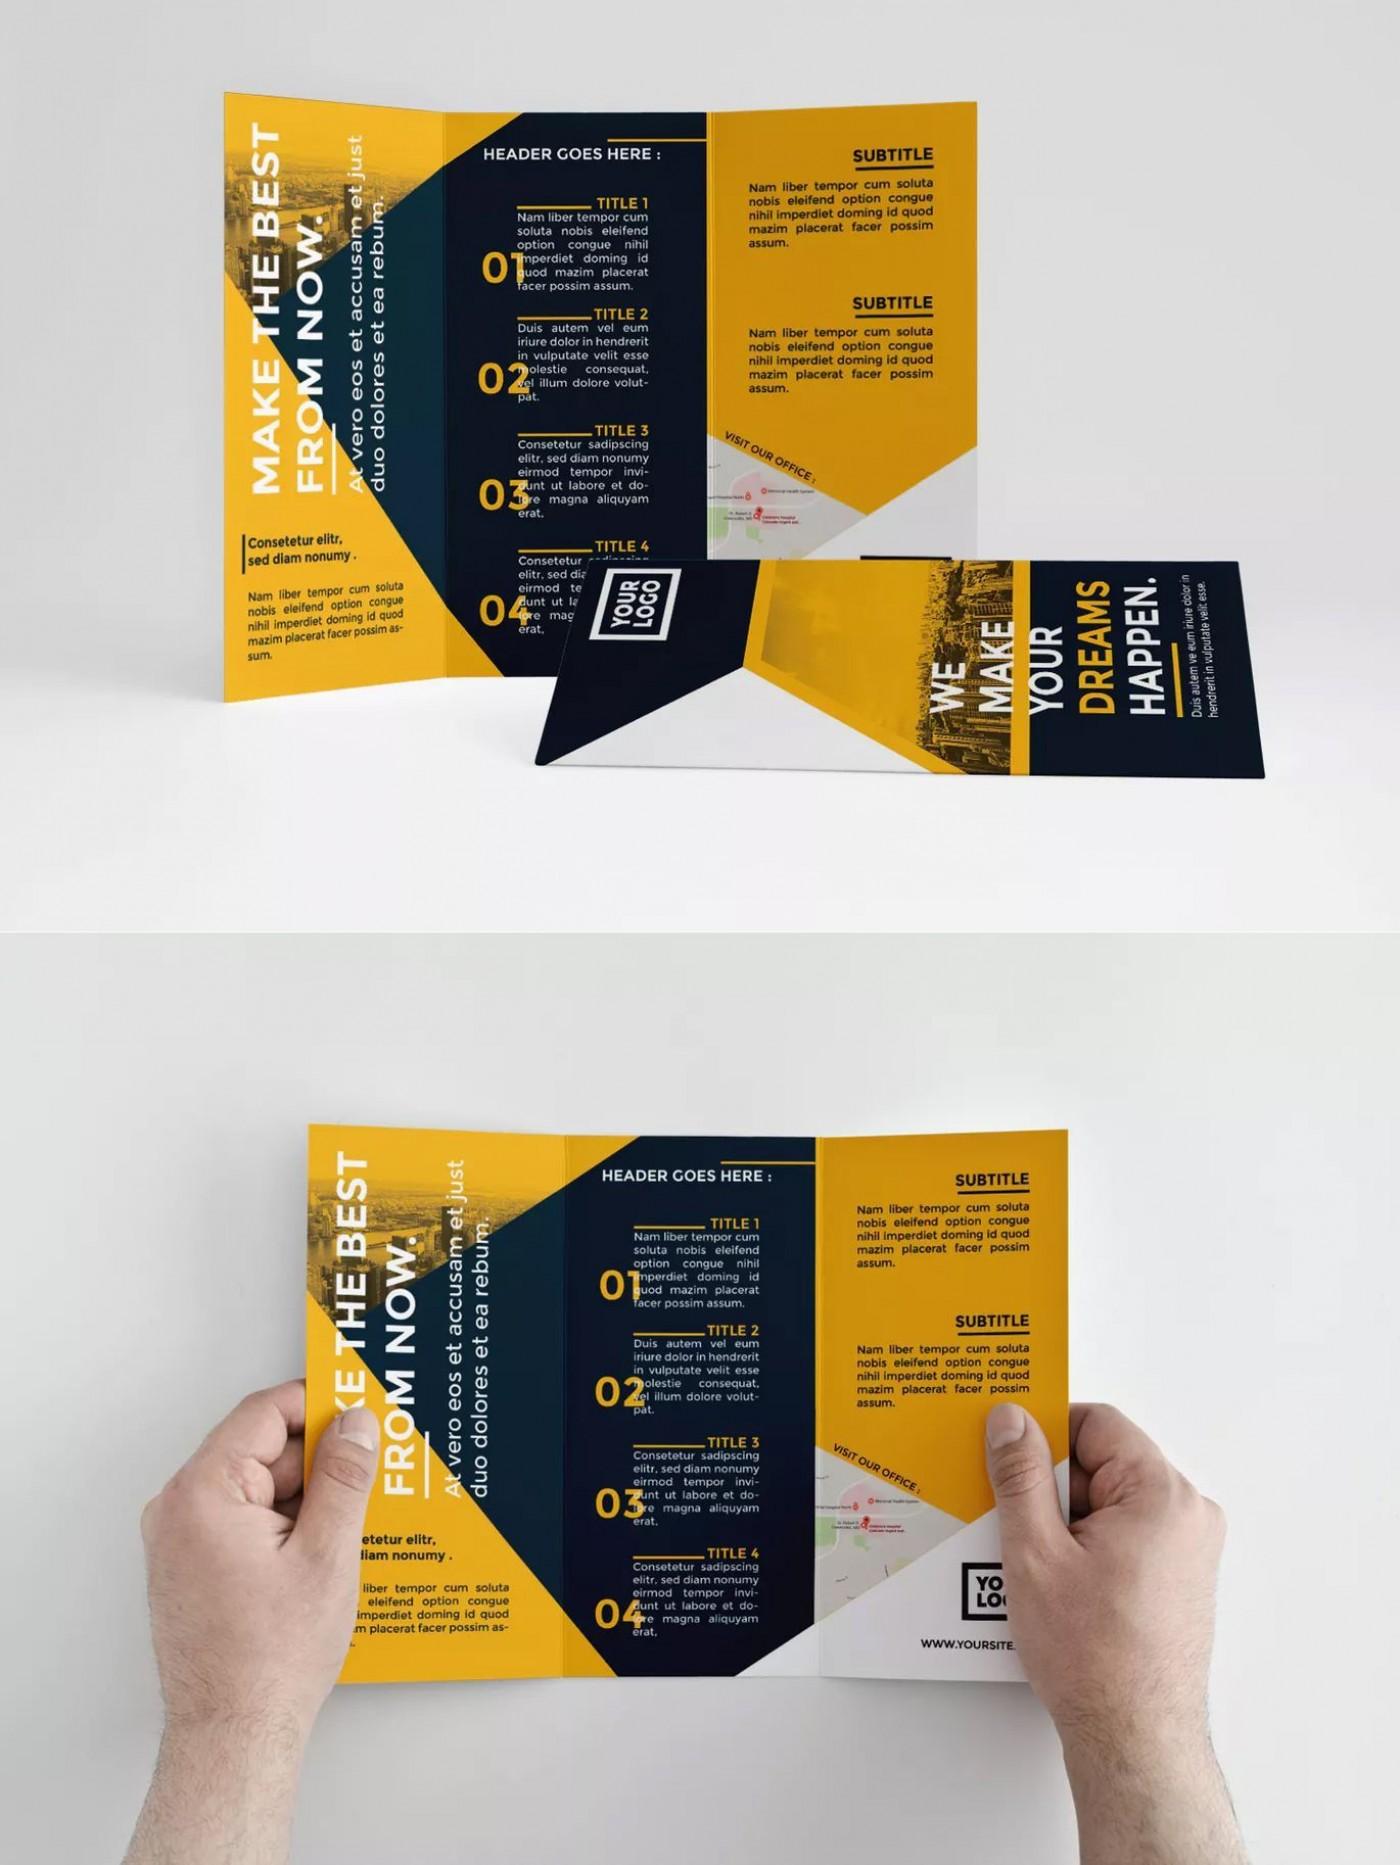 000 Shocking Indesign Trifold Brochure Template Inspiration  Tri Fold A4 Bi Free Download1400